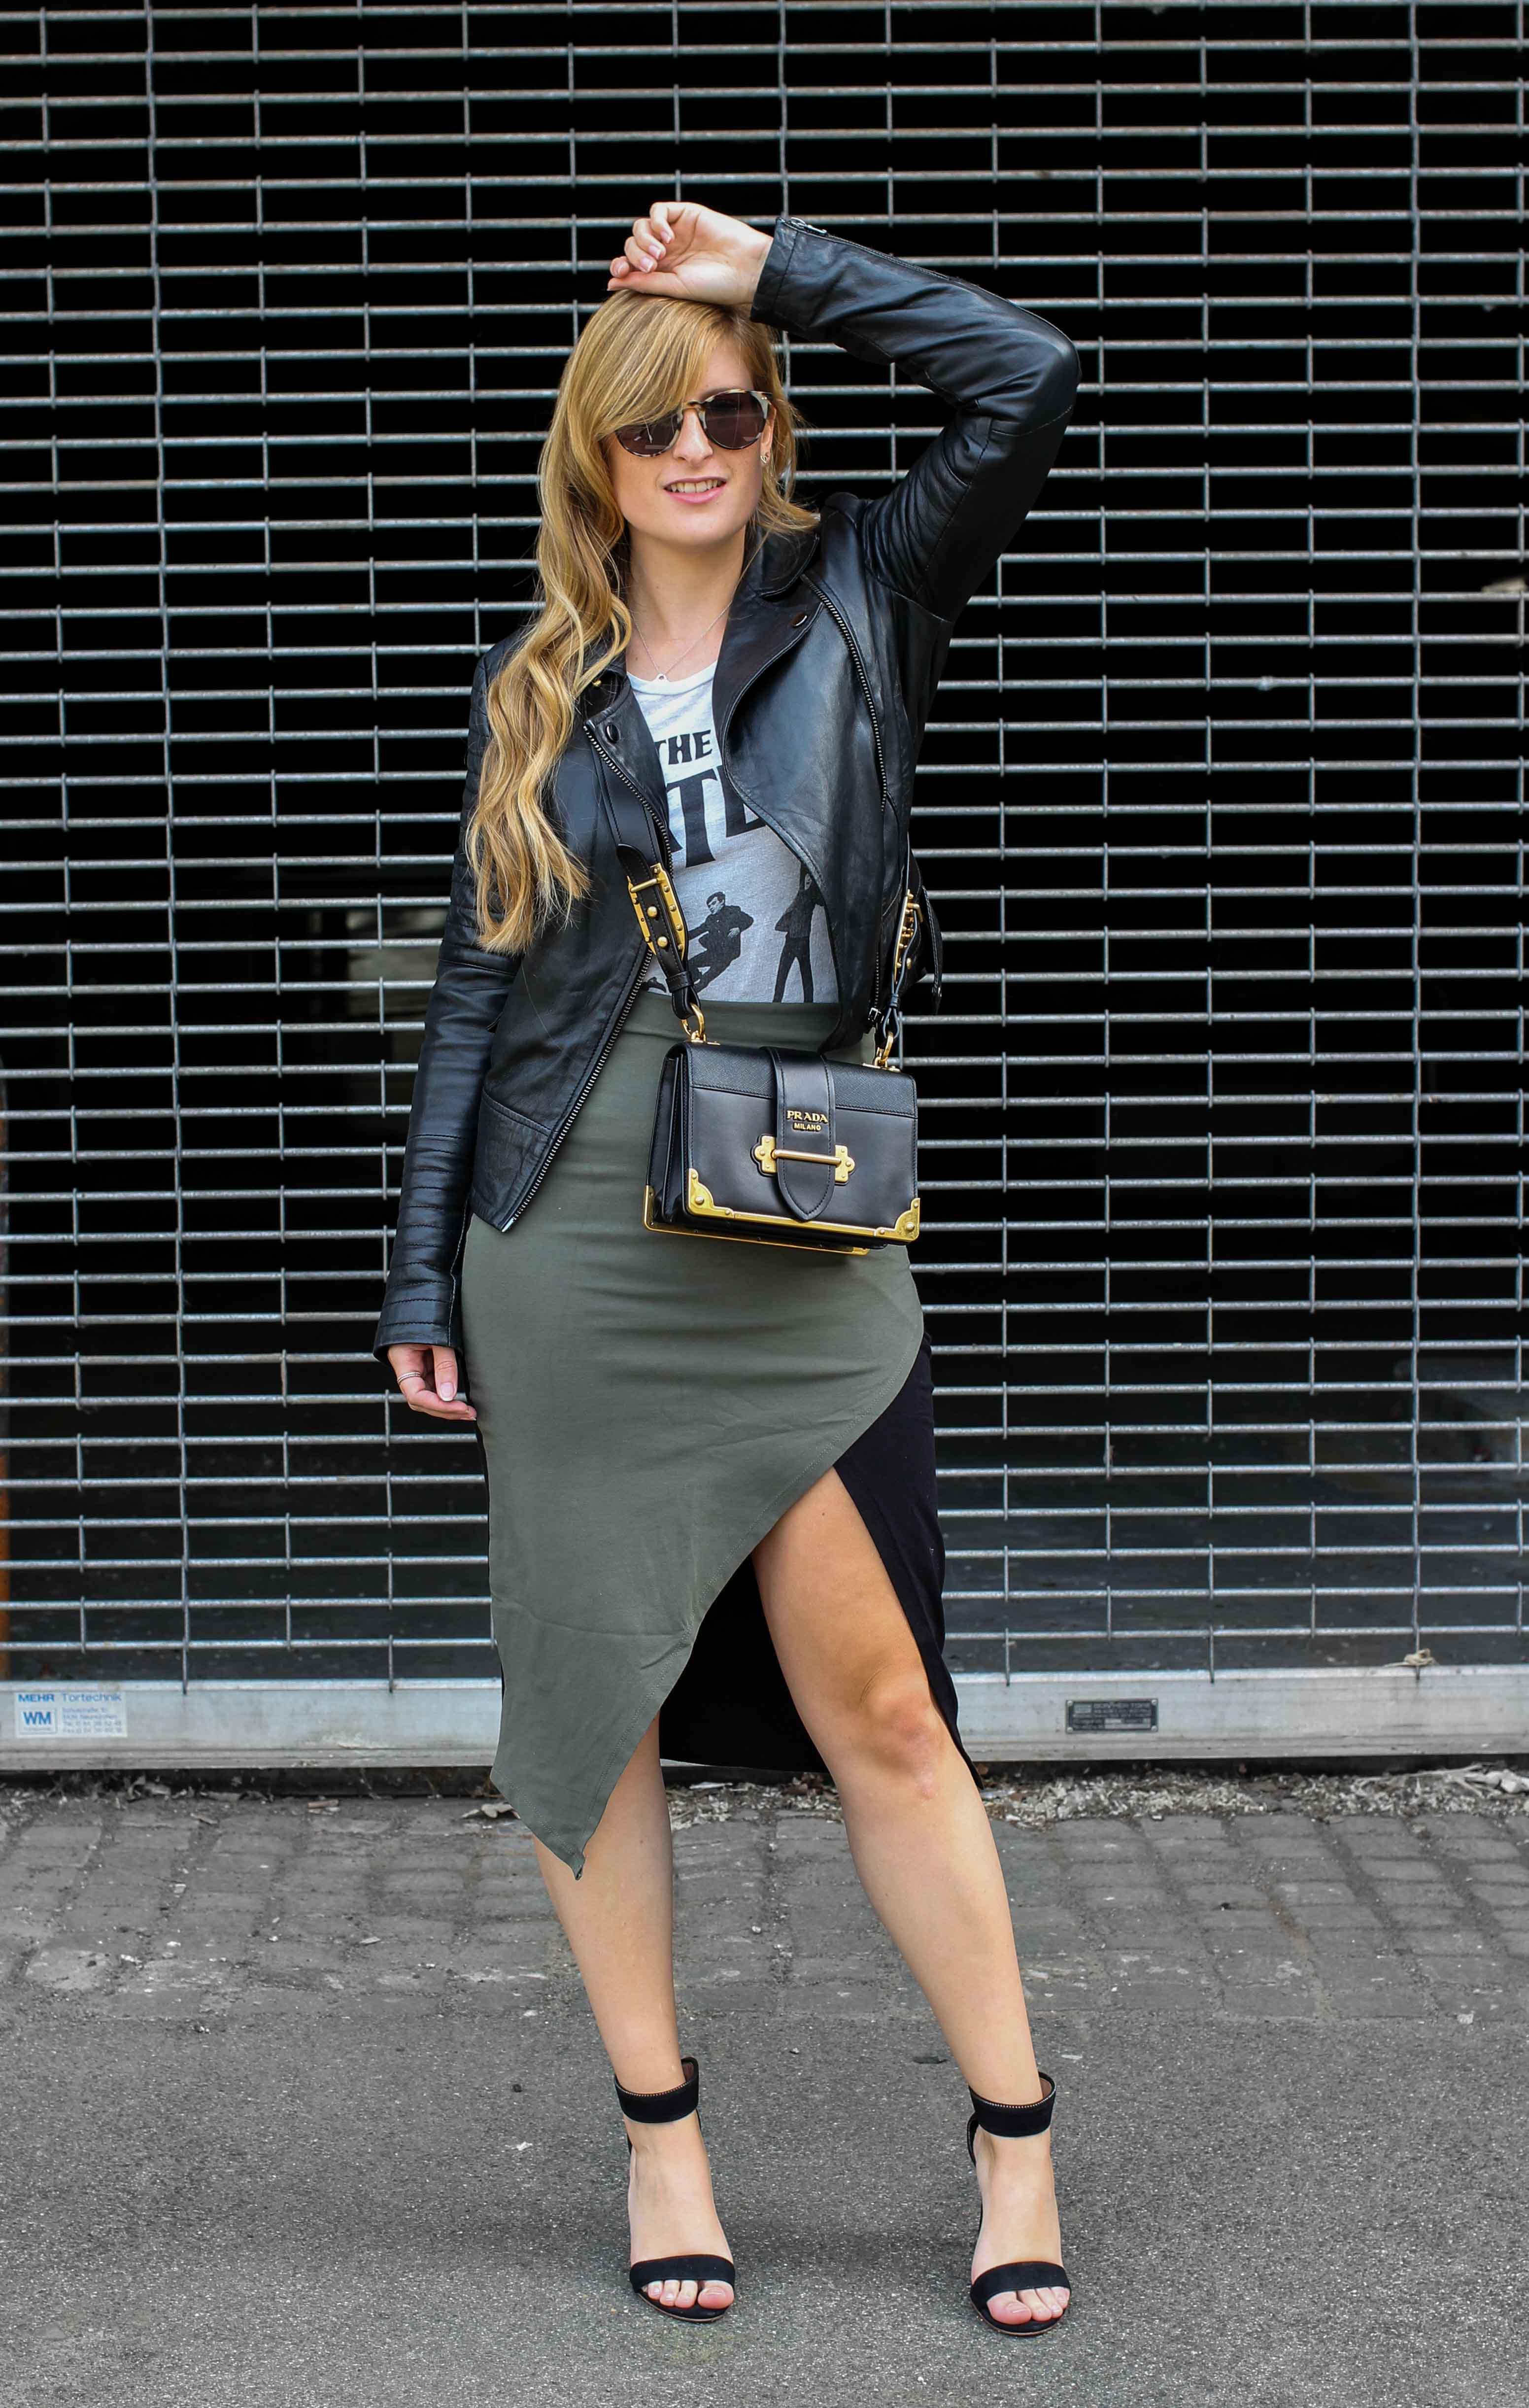 Sommer Streetstyle 2018 asymmetrischer Rock Asos kombinieren Bandshirt the beatles Lederjacke Prada Cahier Designertasche Modeblog Köln Blogger DE Outfit Sommer Brinisfashionbook 1